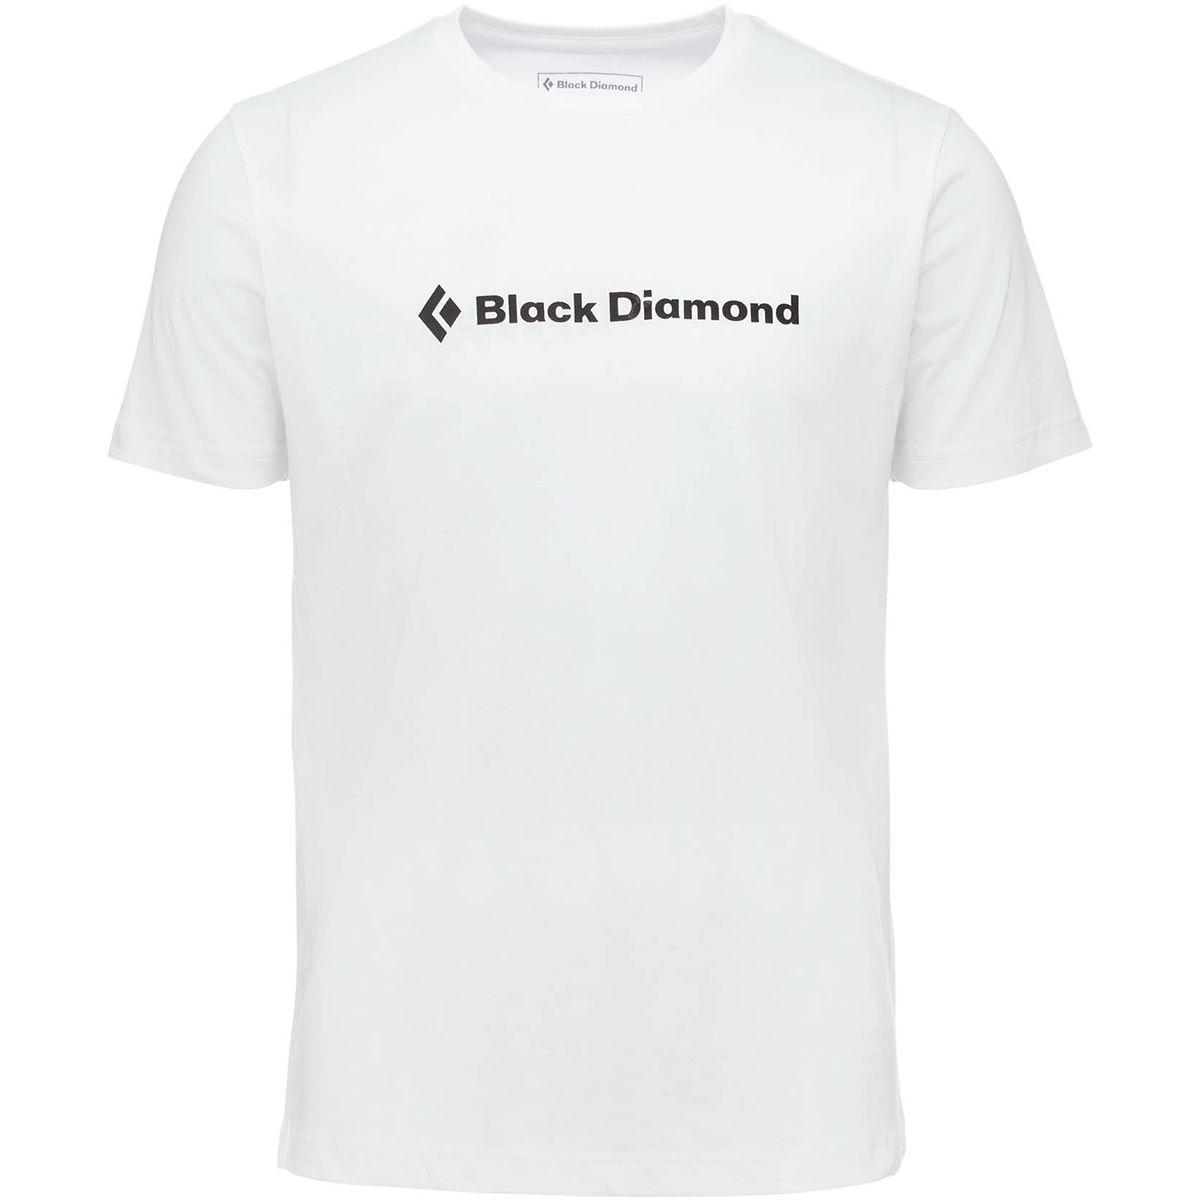 Black Diamond Brand Tee